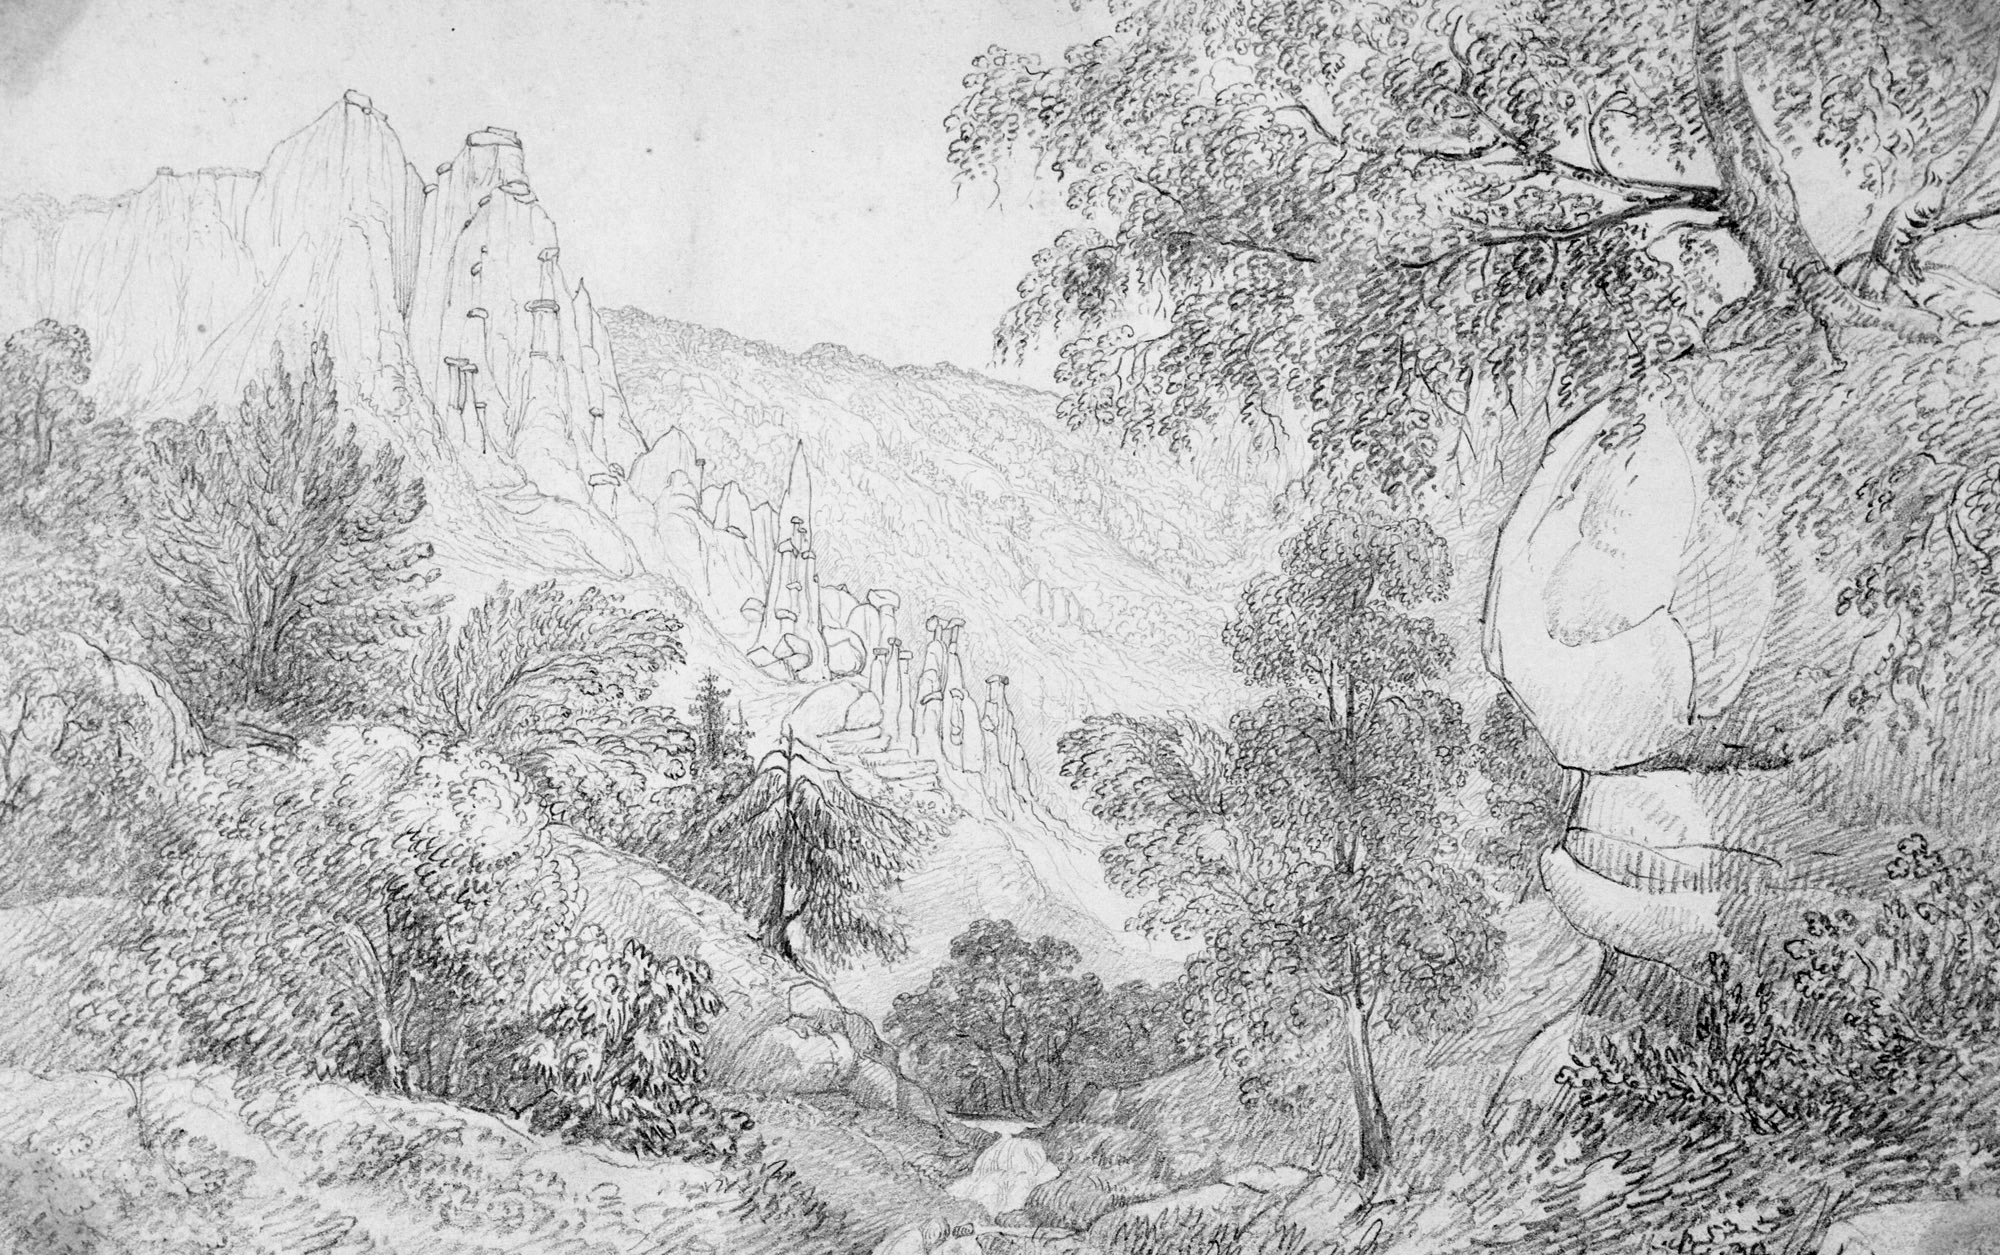 Clay Columns at Stalde in the Visp Thal Valais, Sept. 4 1821